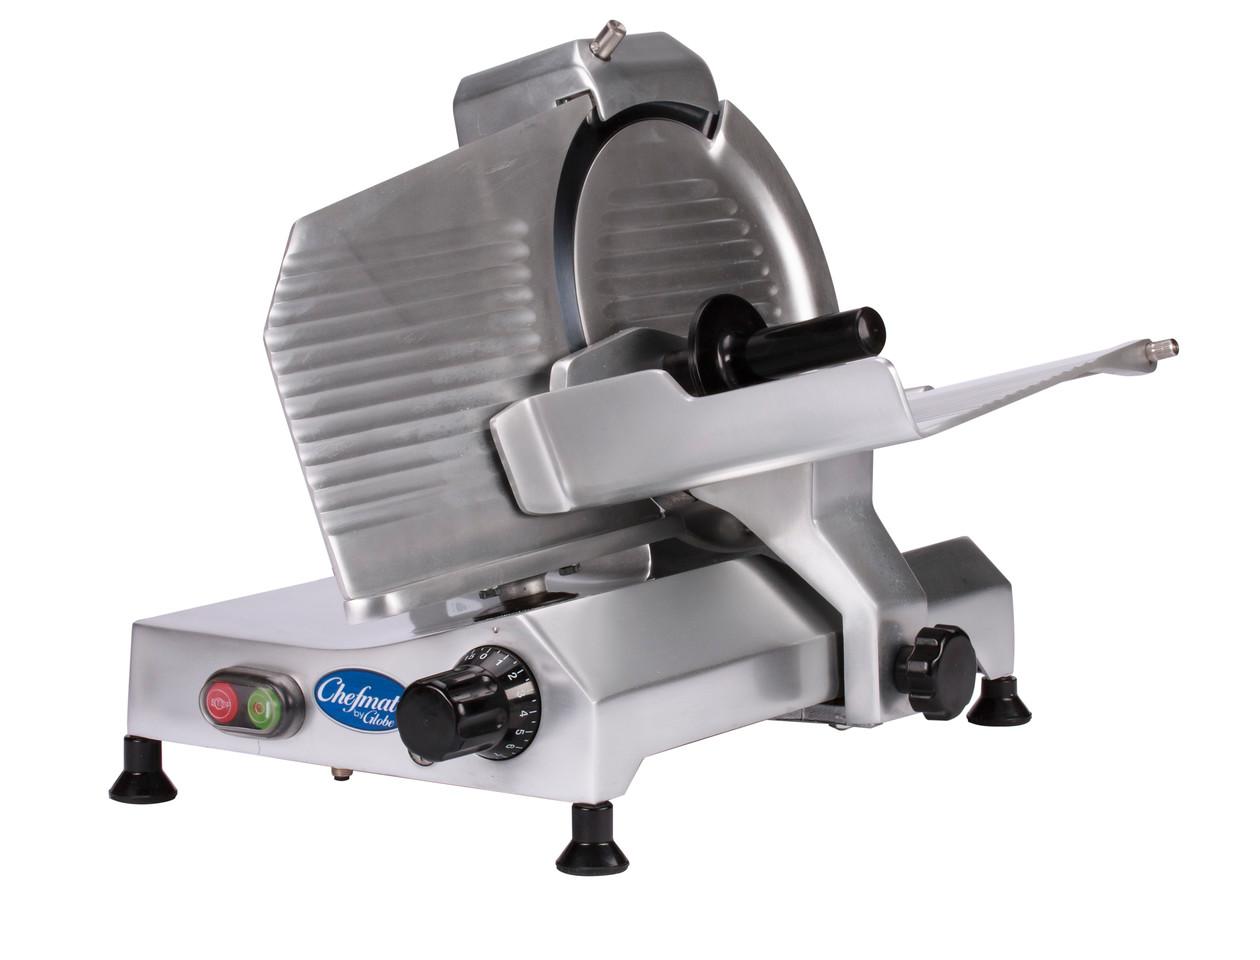 Globe C9 food slicer, electric